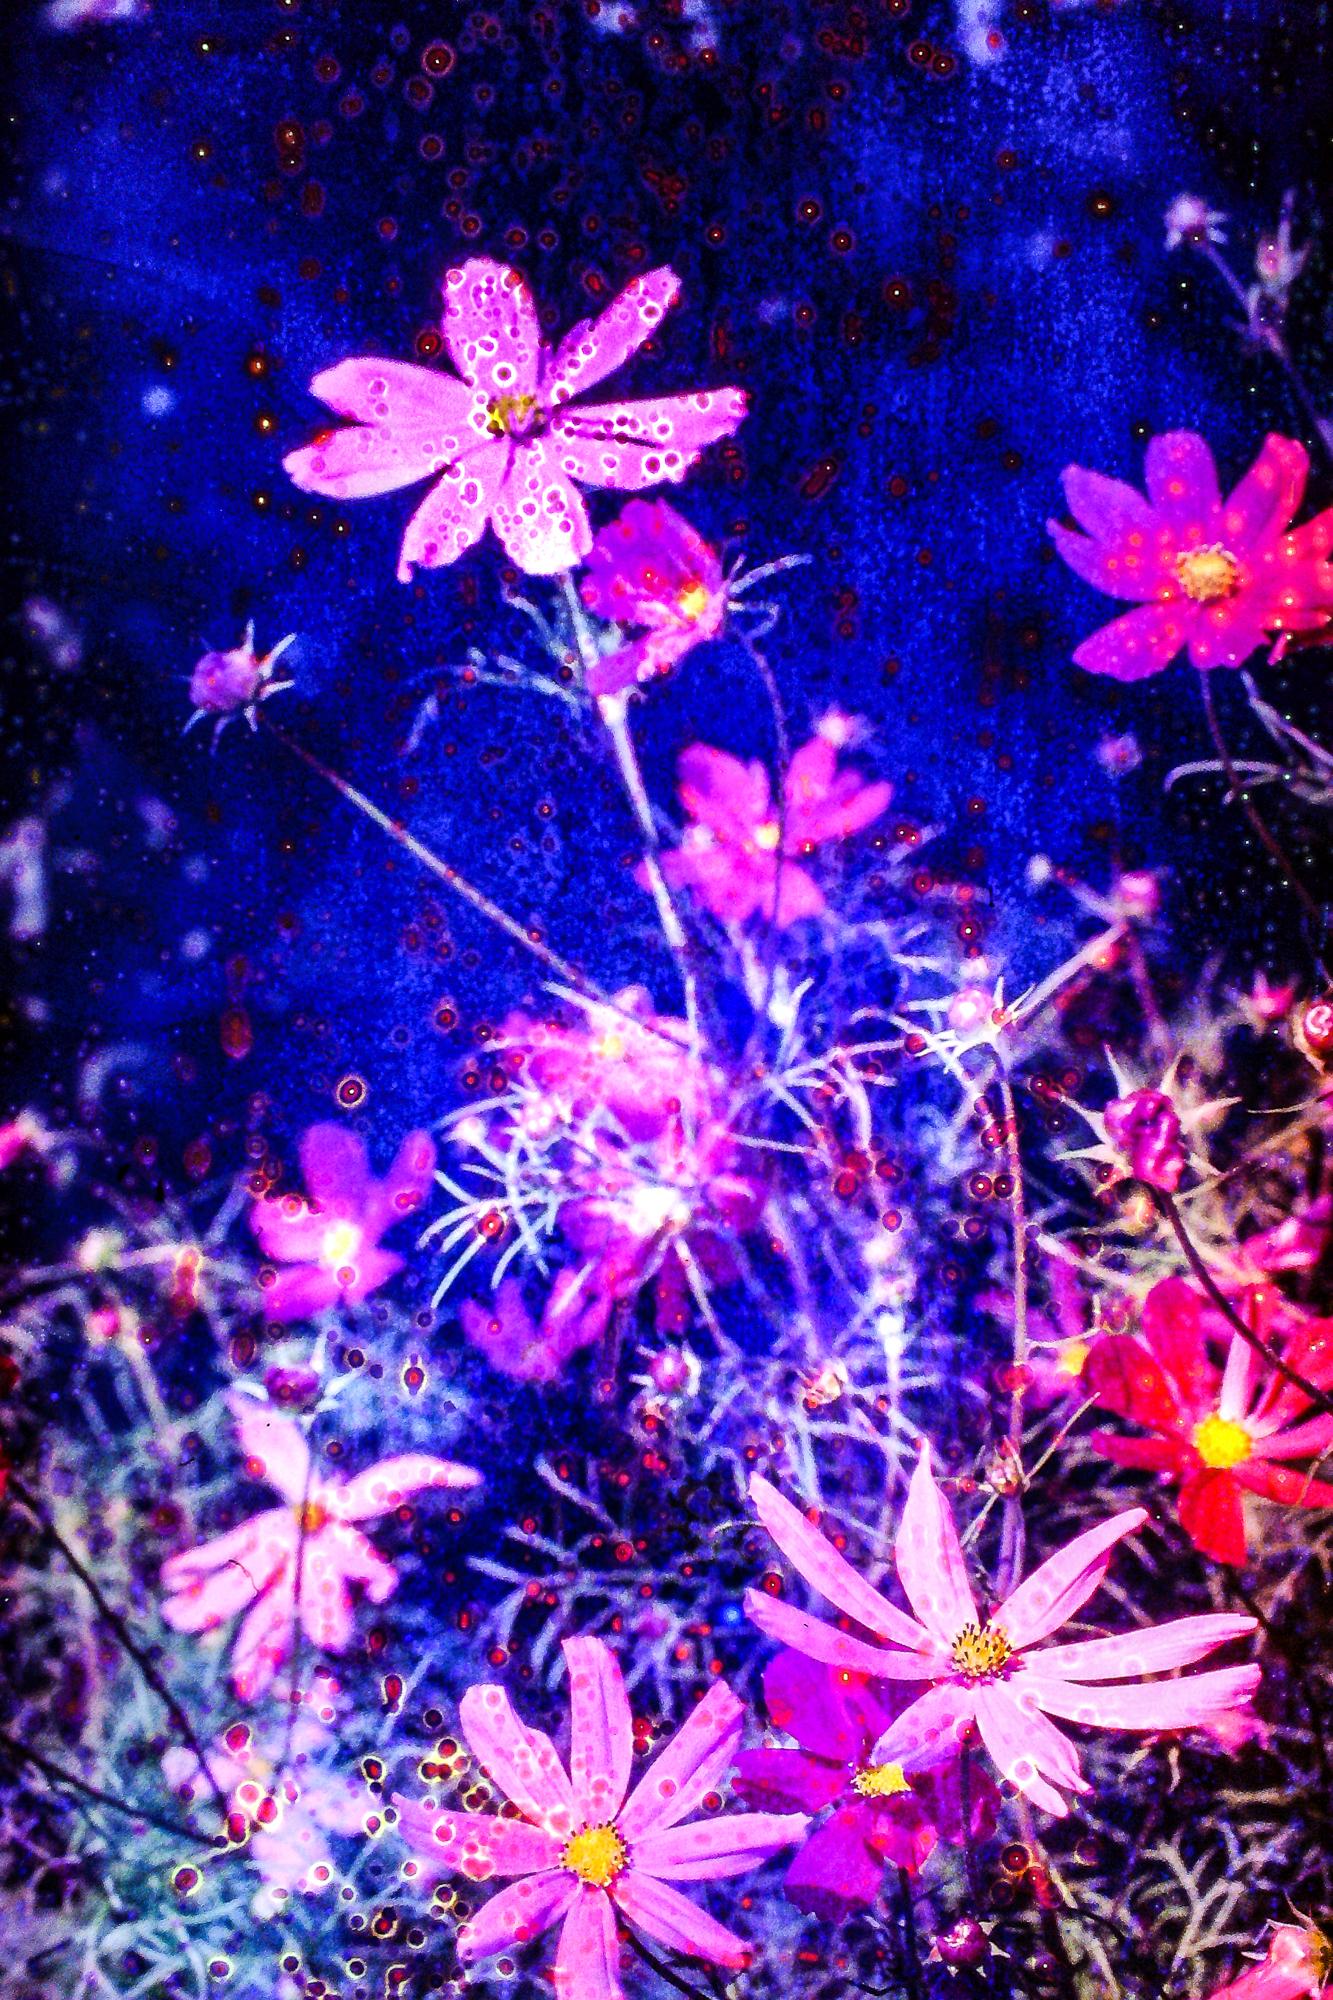 © Mateusz Wiglinzki | Bloom